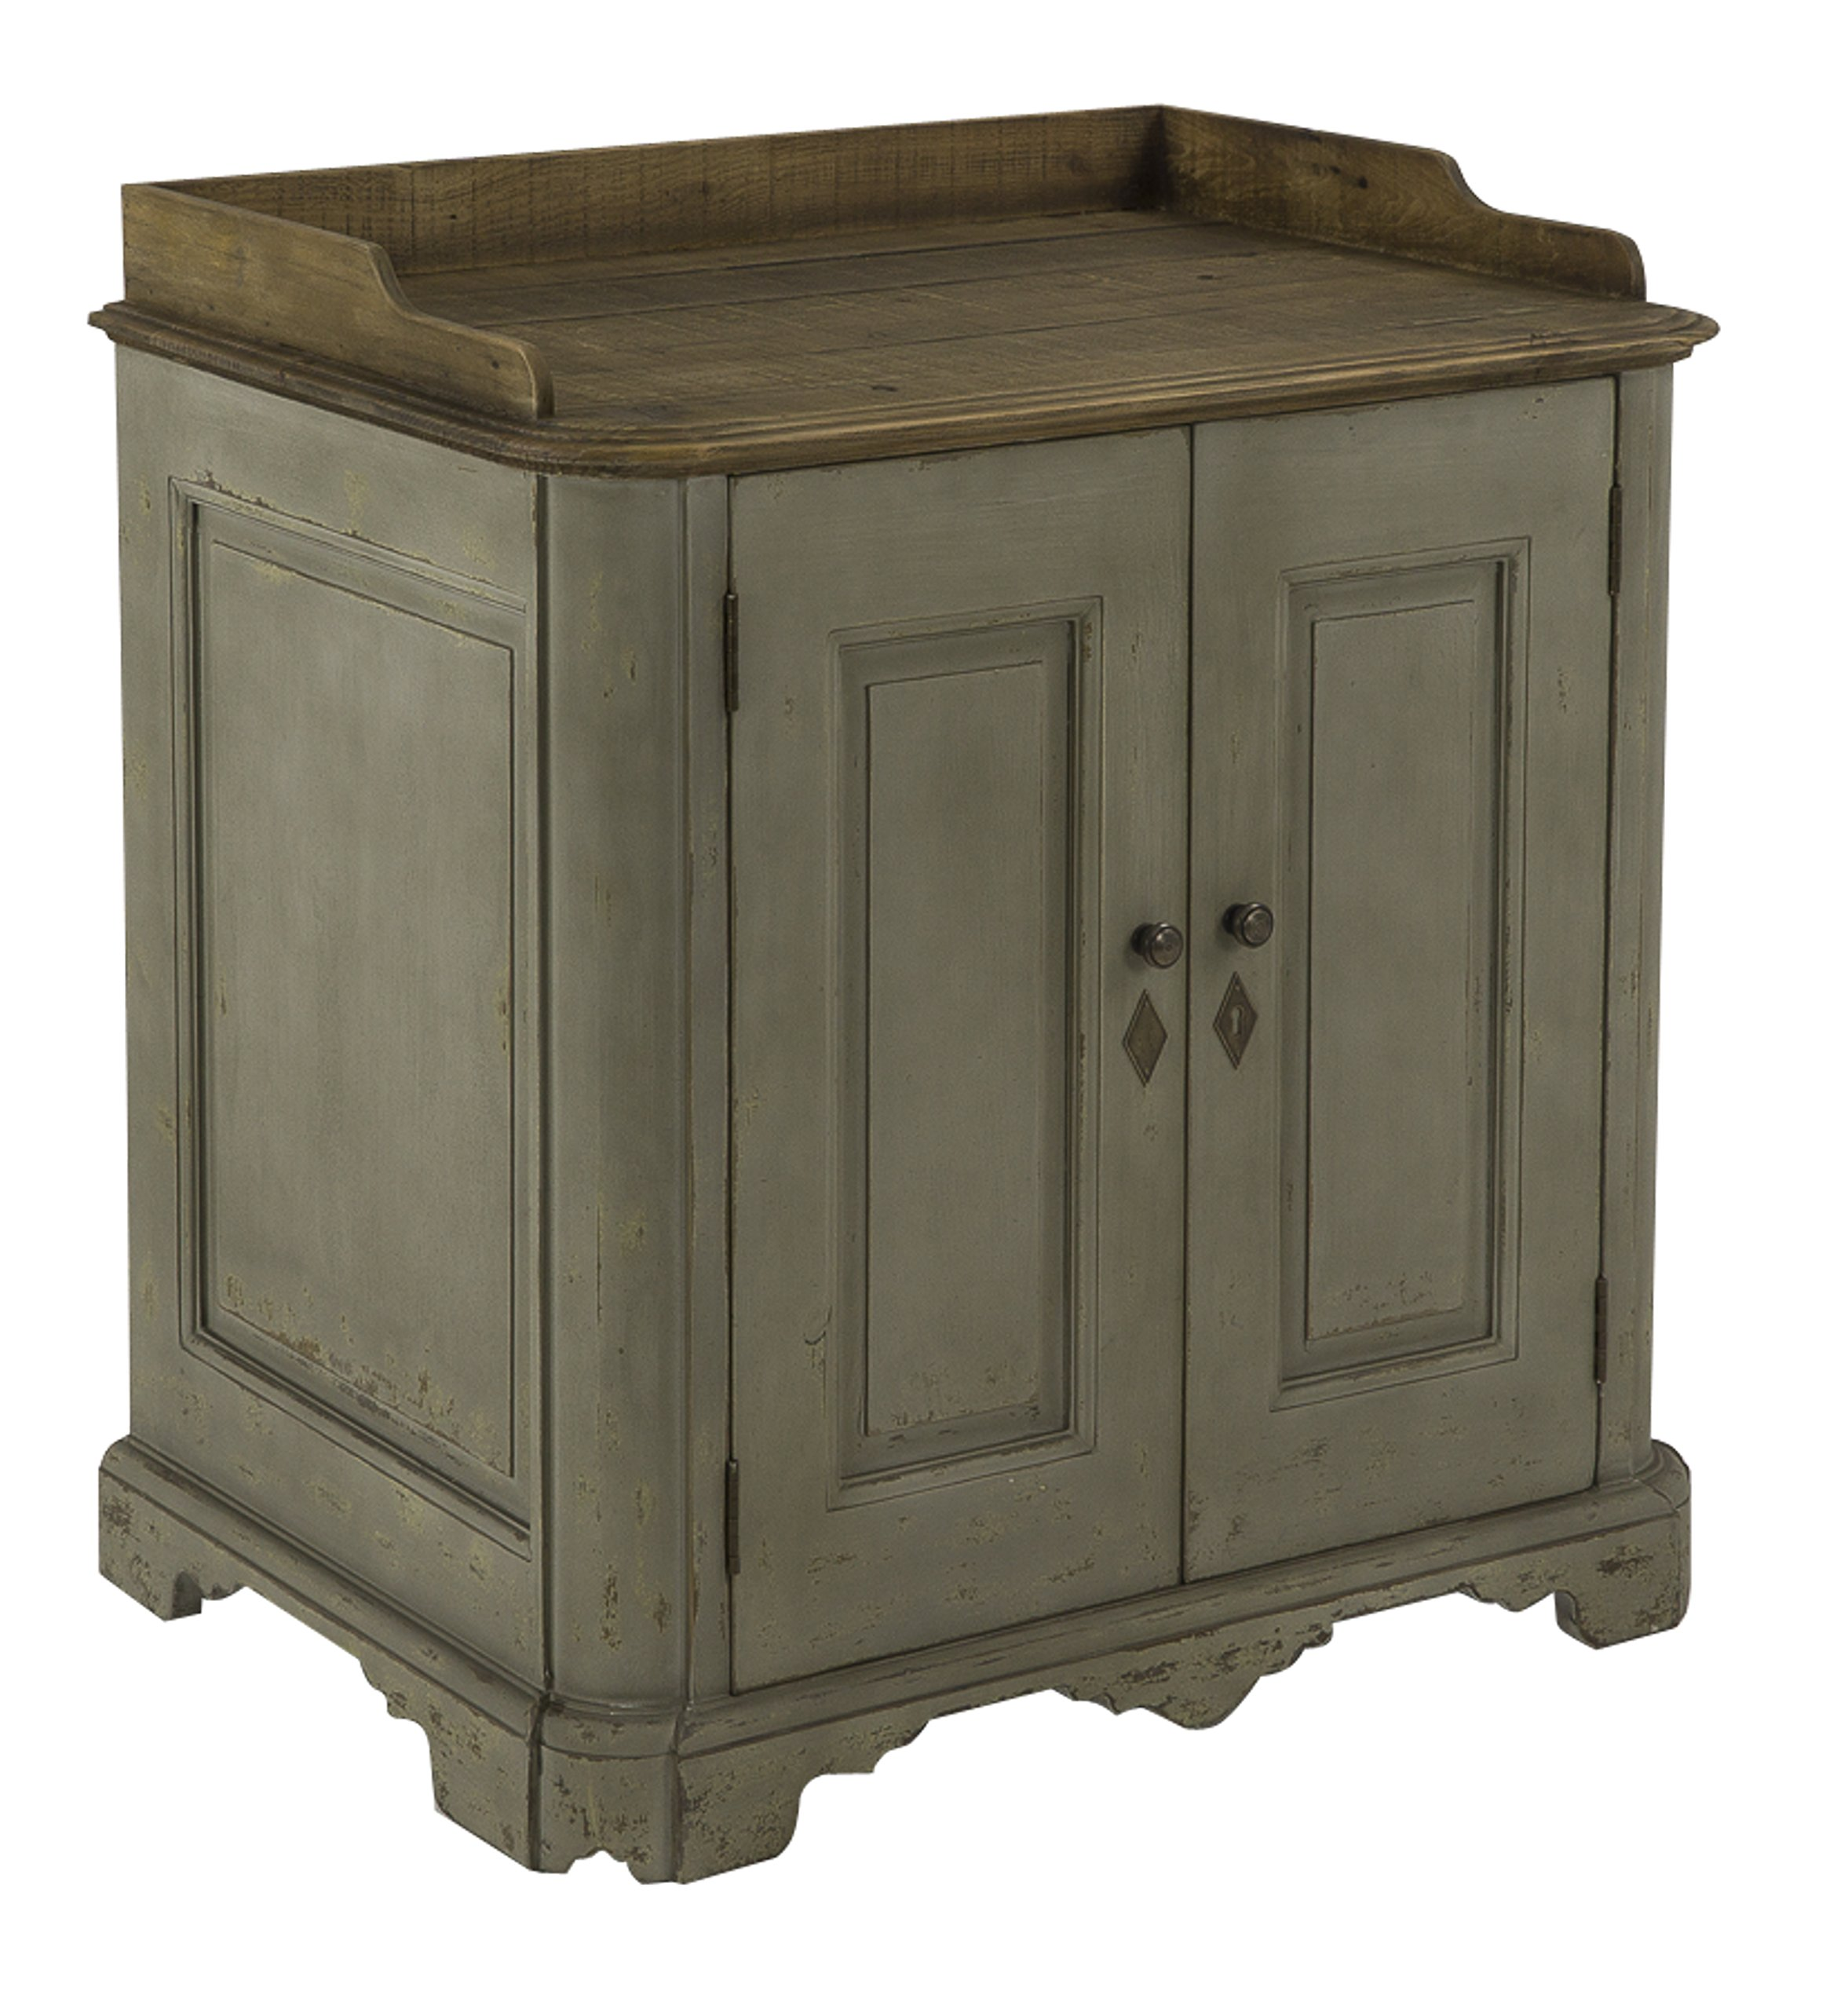 MyGift Rustic Wood Kitchen /& Bathroom Countertop Cabinet w//Glass Windows